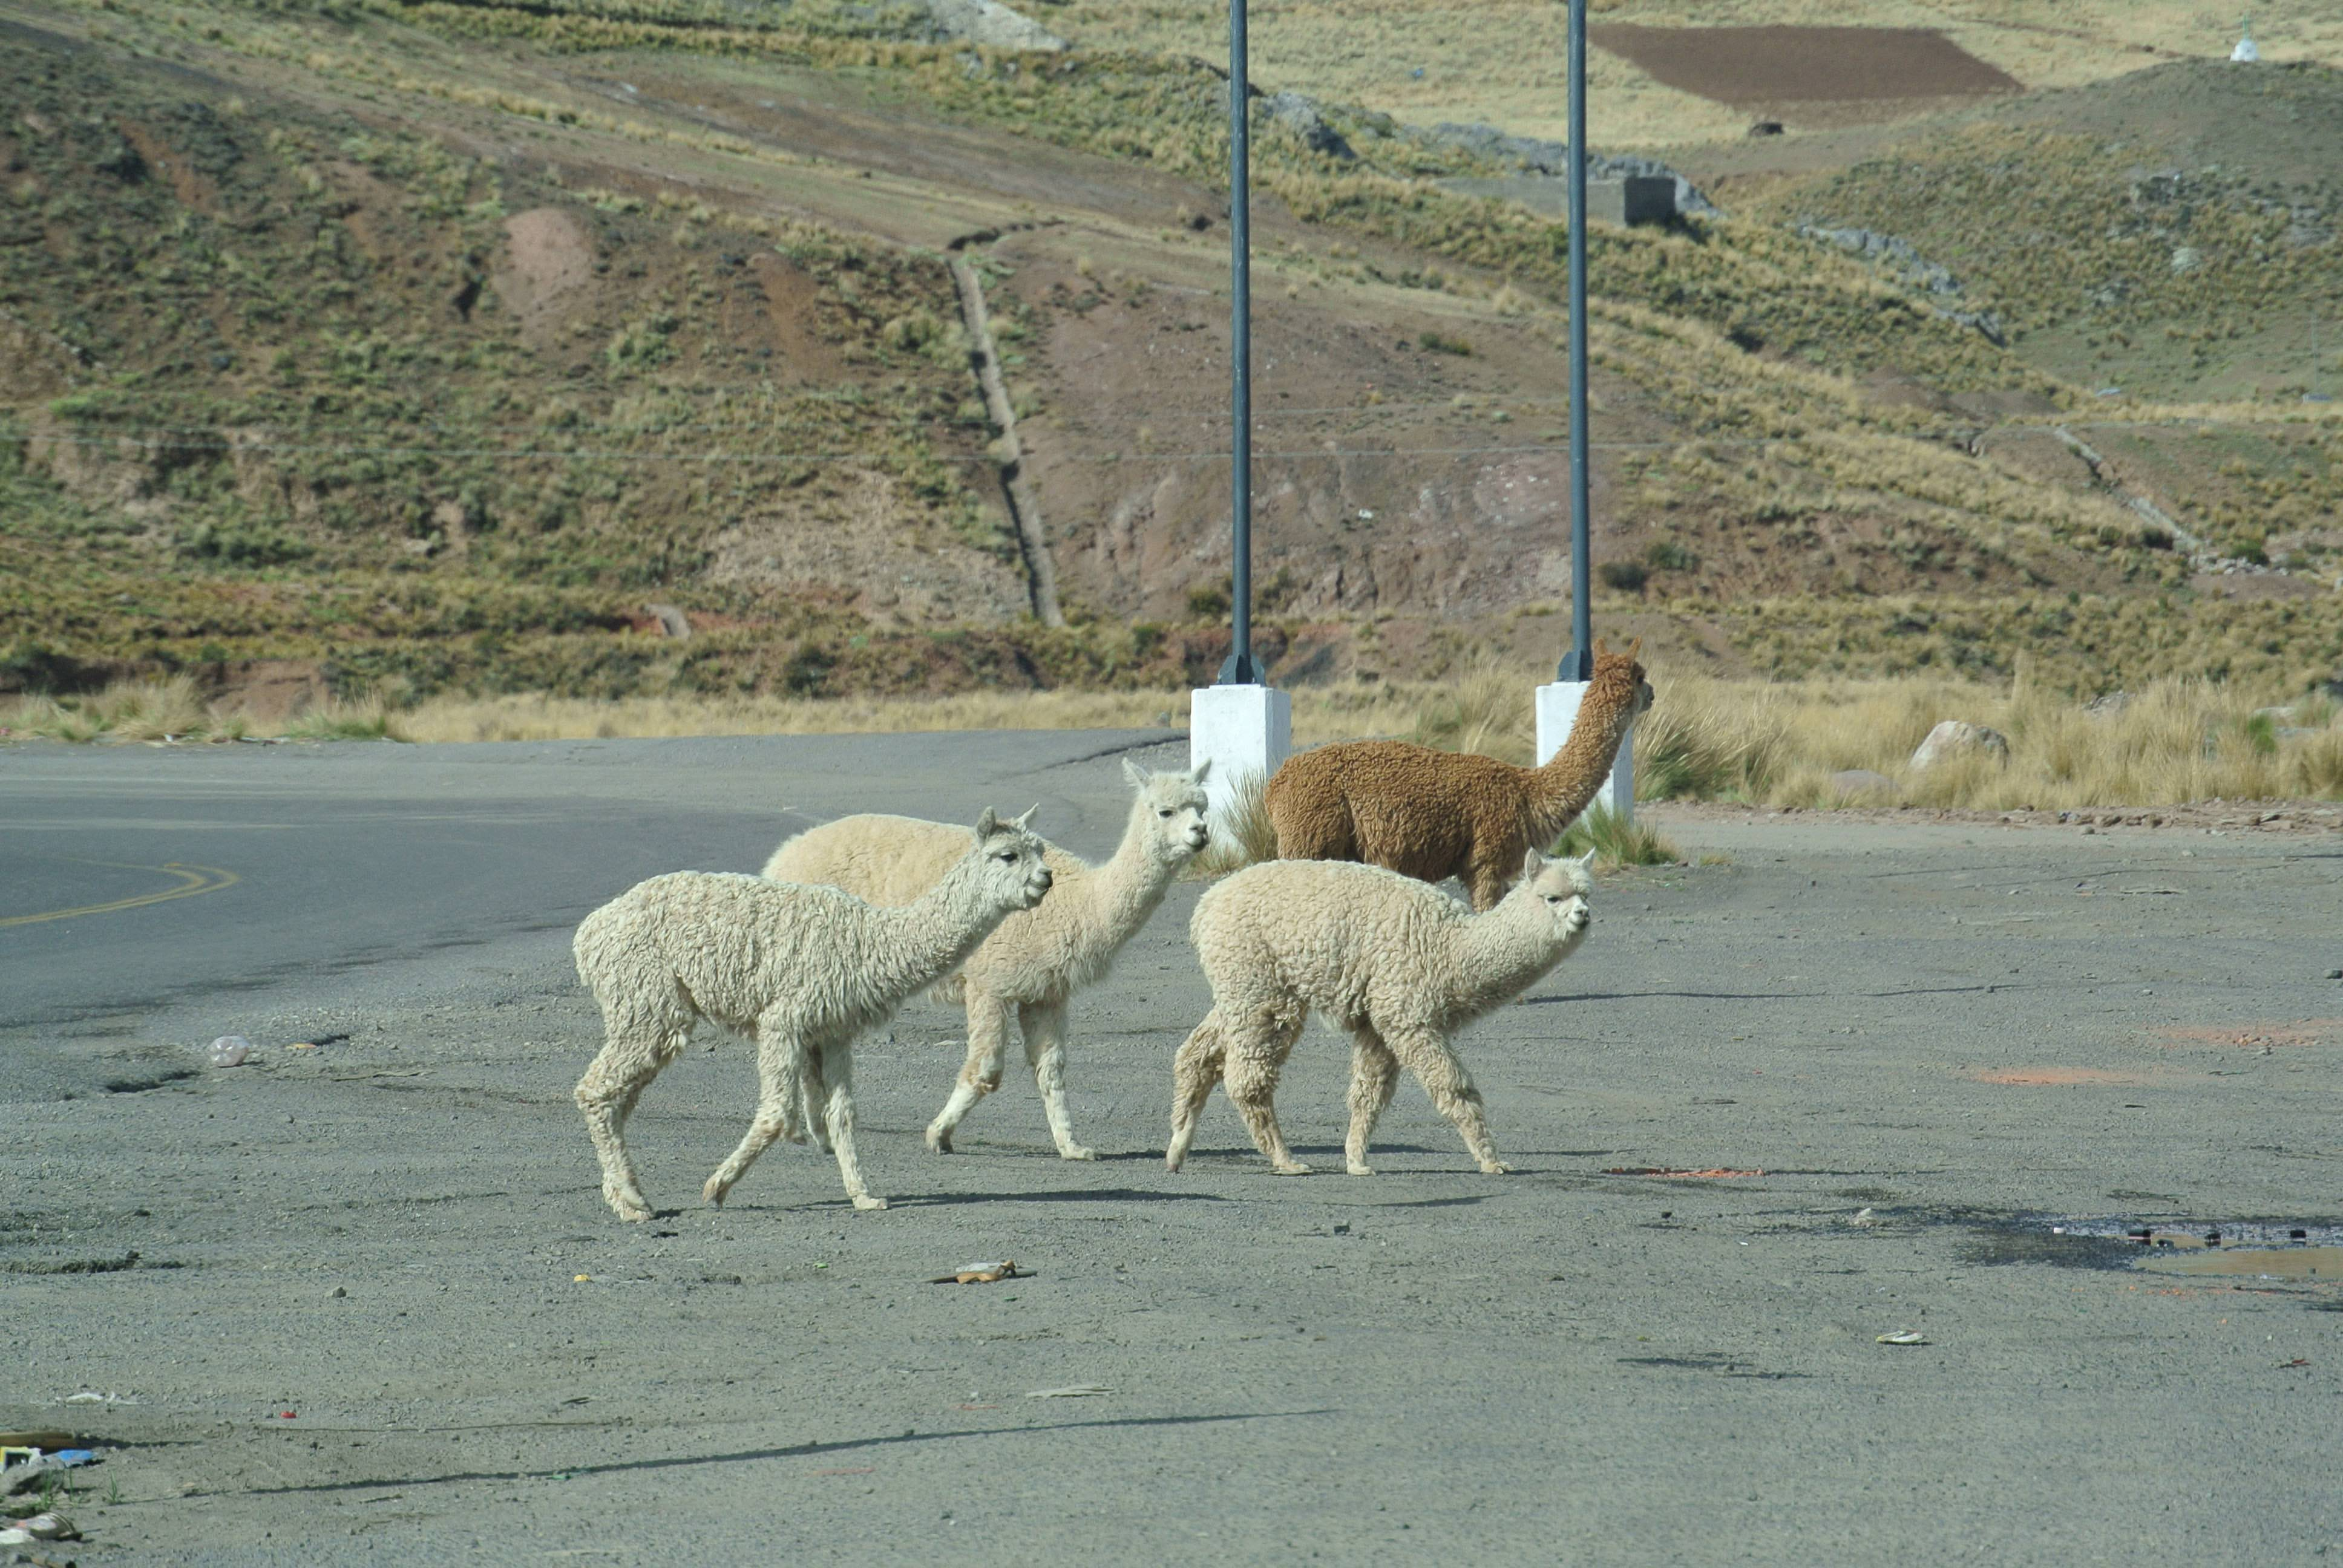 009 2211 Titicacasee - Laguna Lagunillas 12jpeg